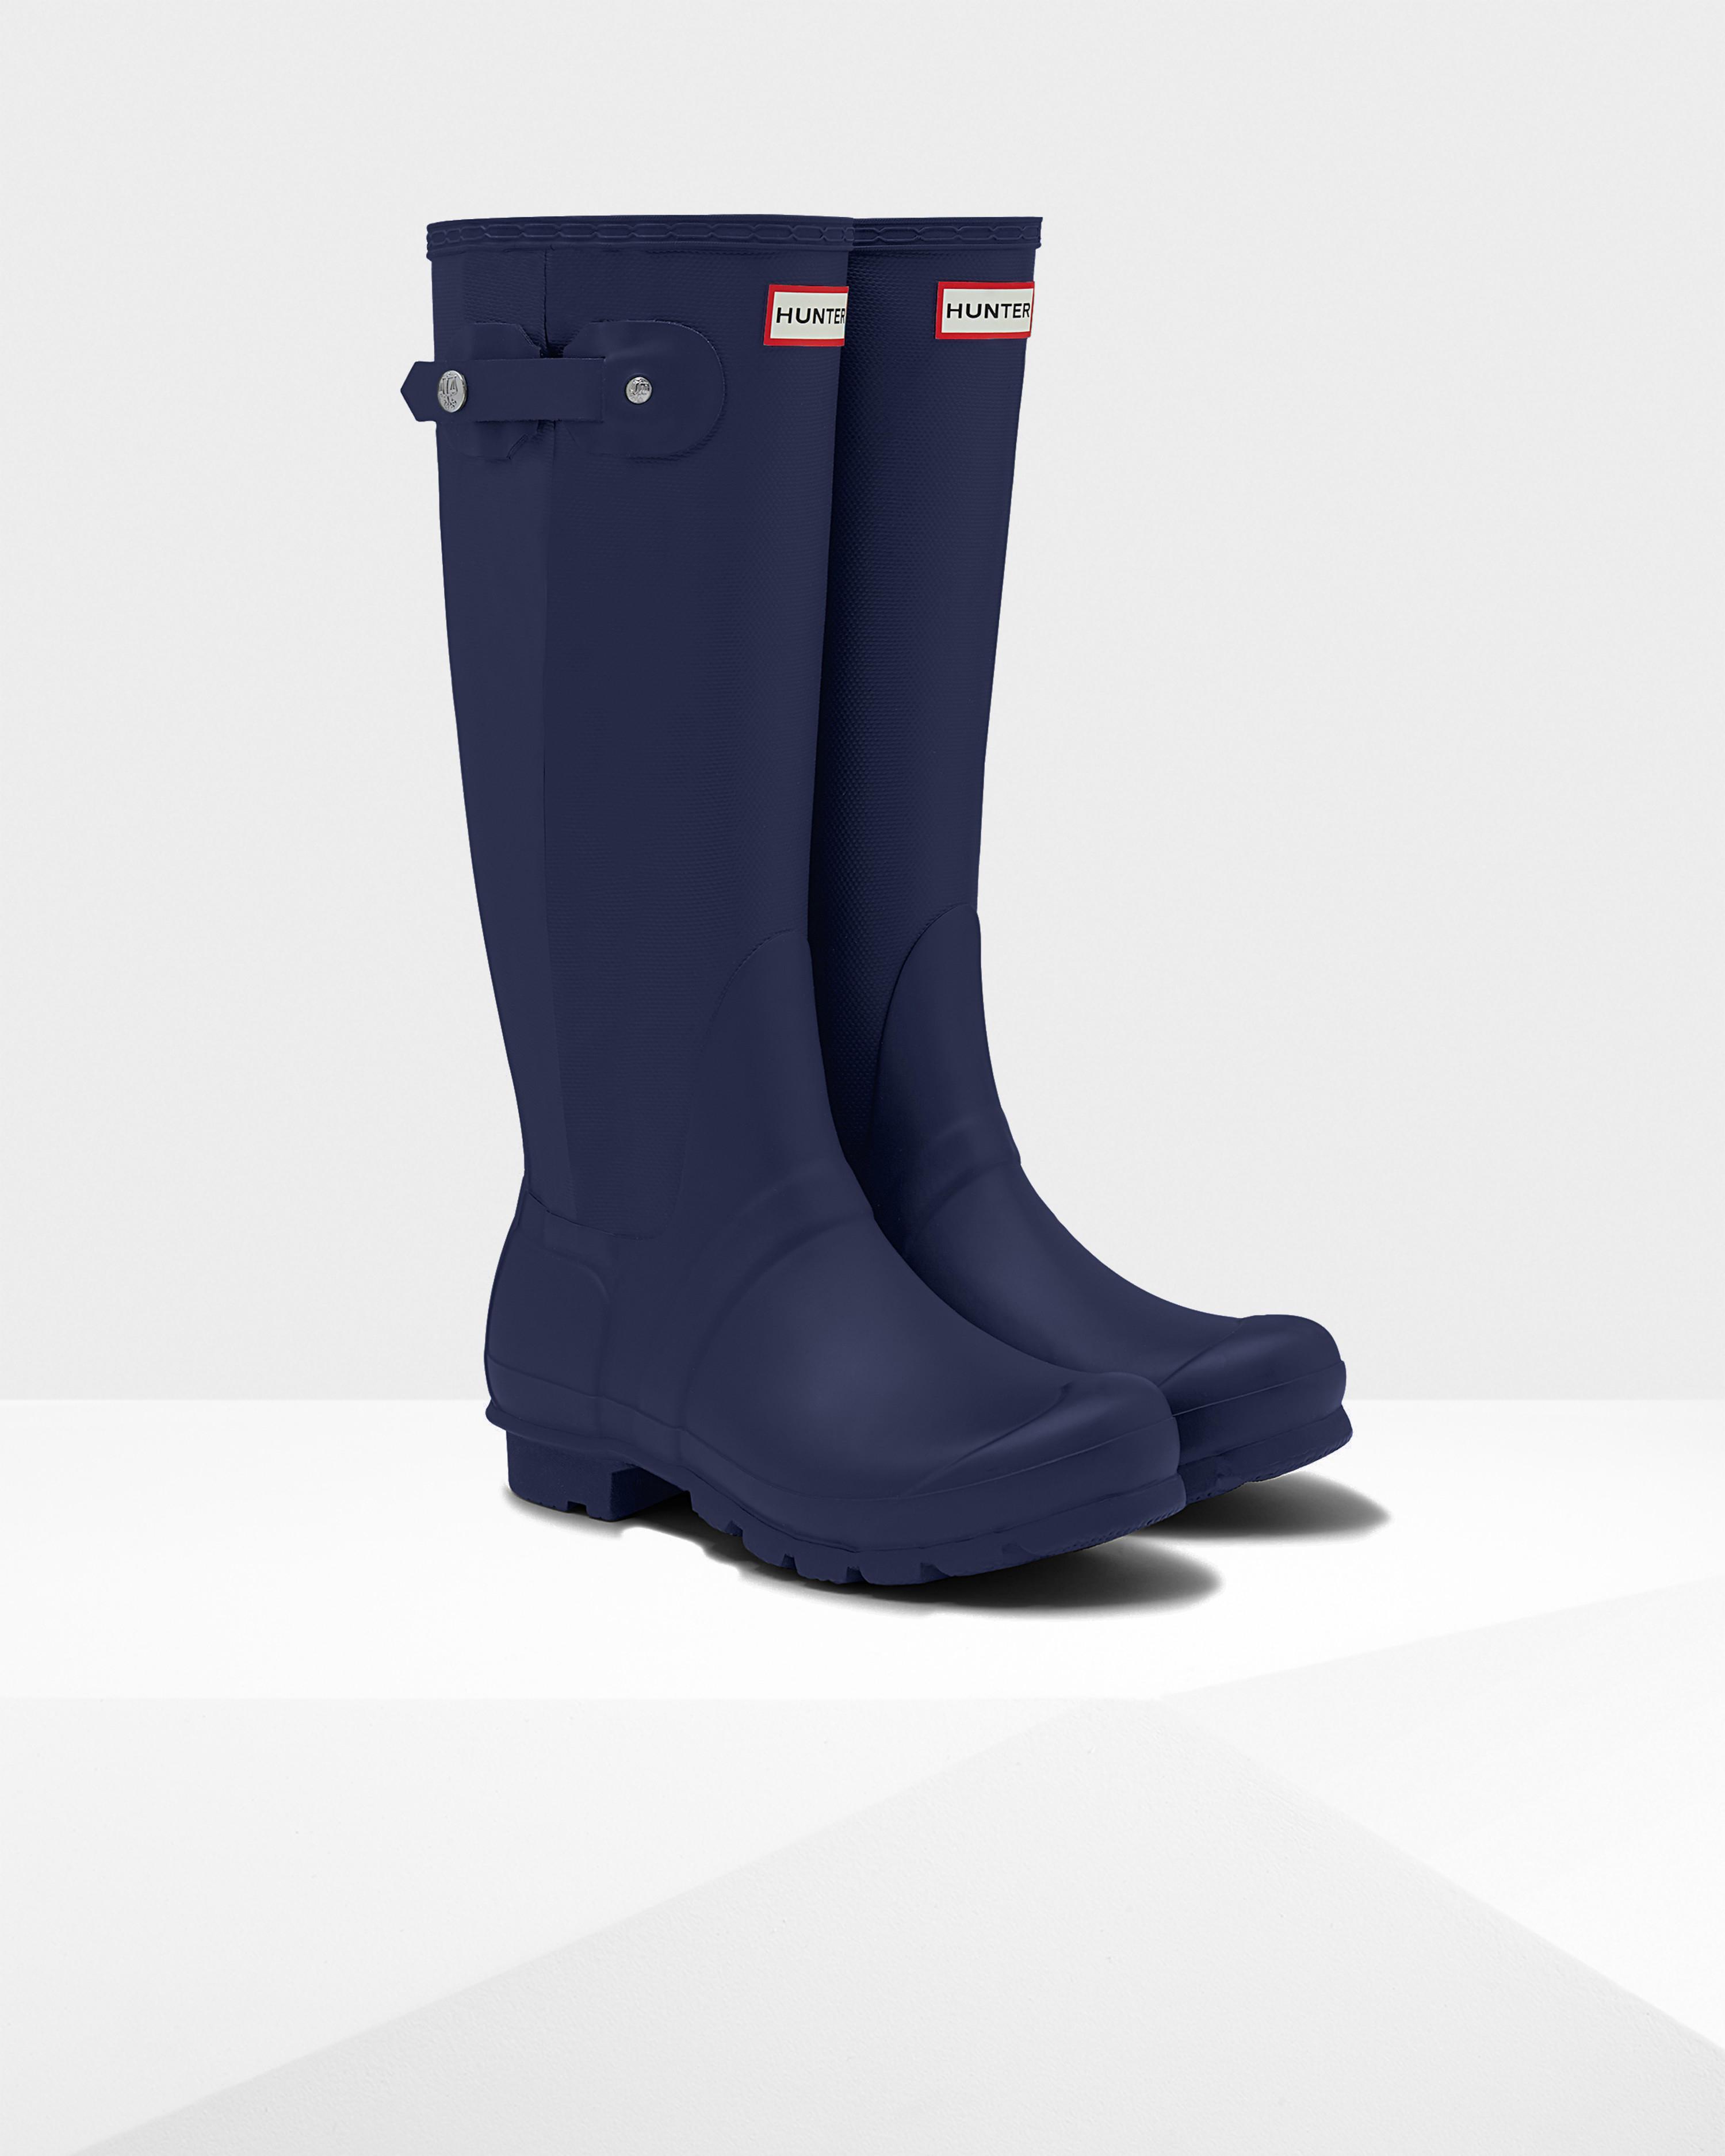 hunter original slim textured rain boots in blue navy lyst. Black Bedroom Furniture Sets. Home Design Ideas